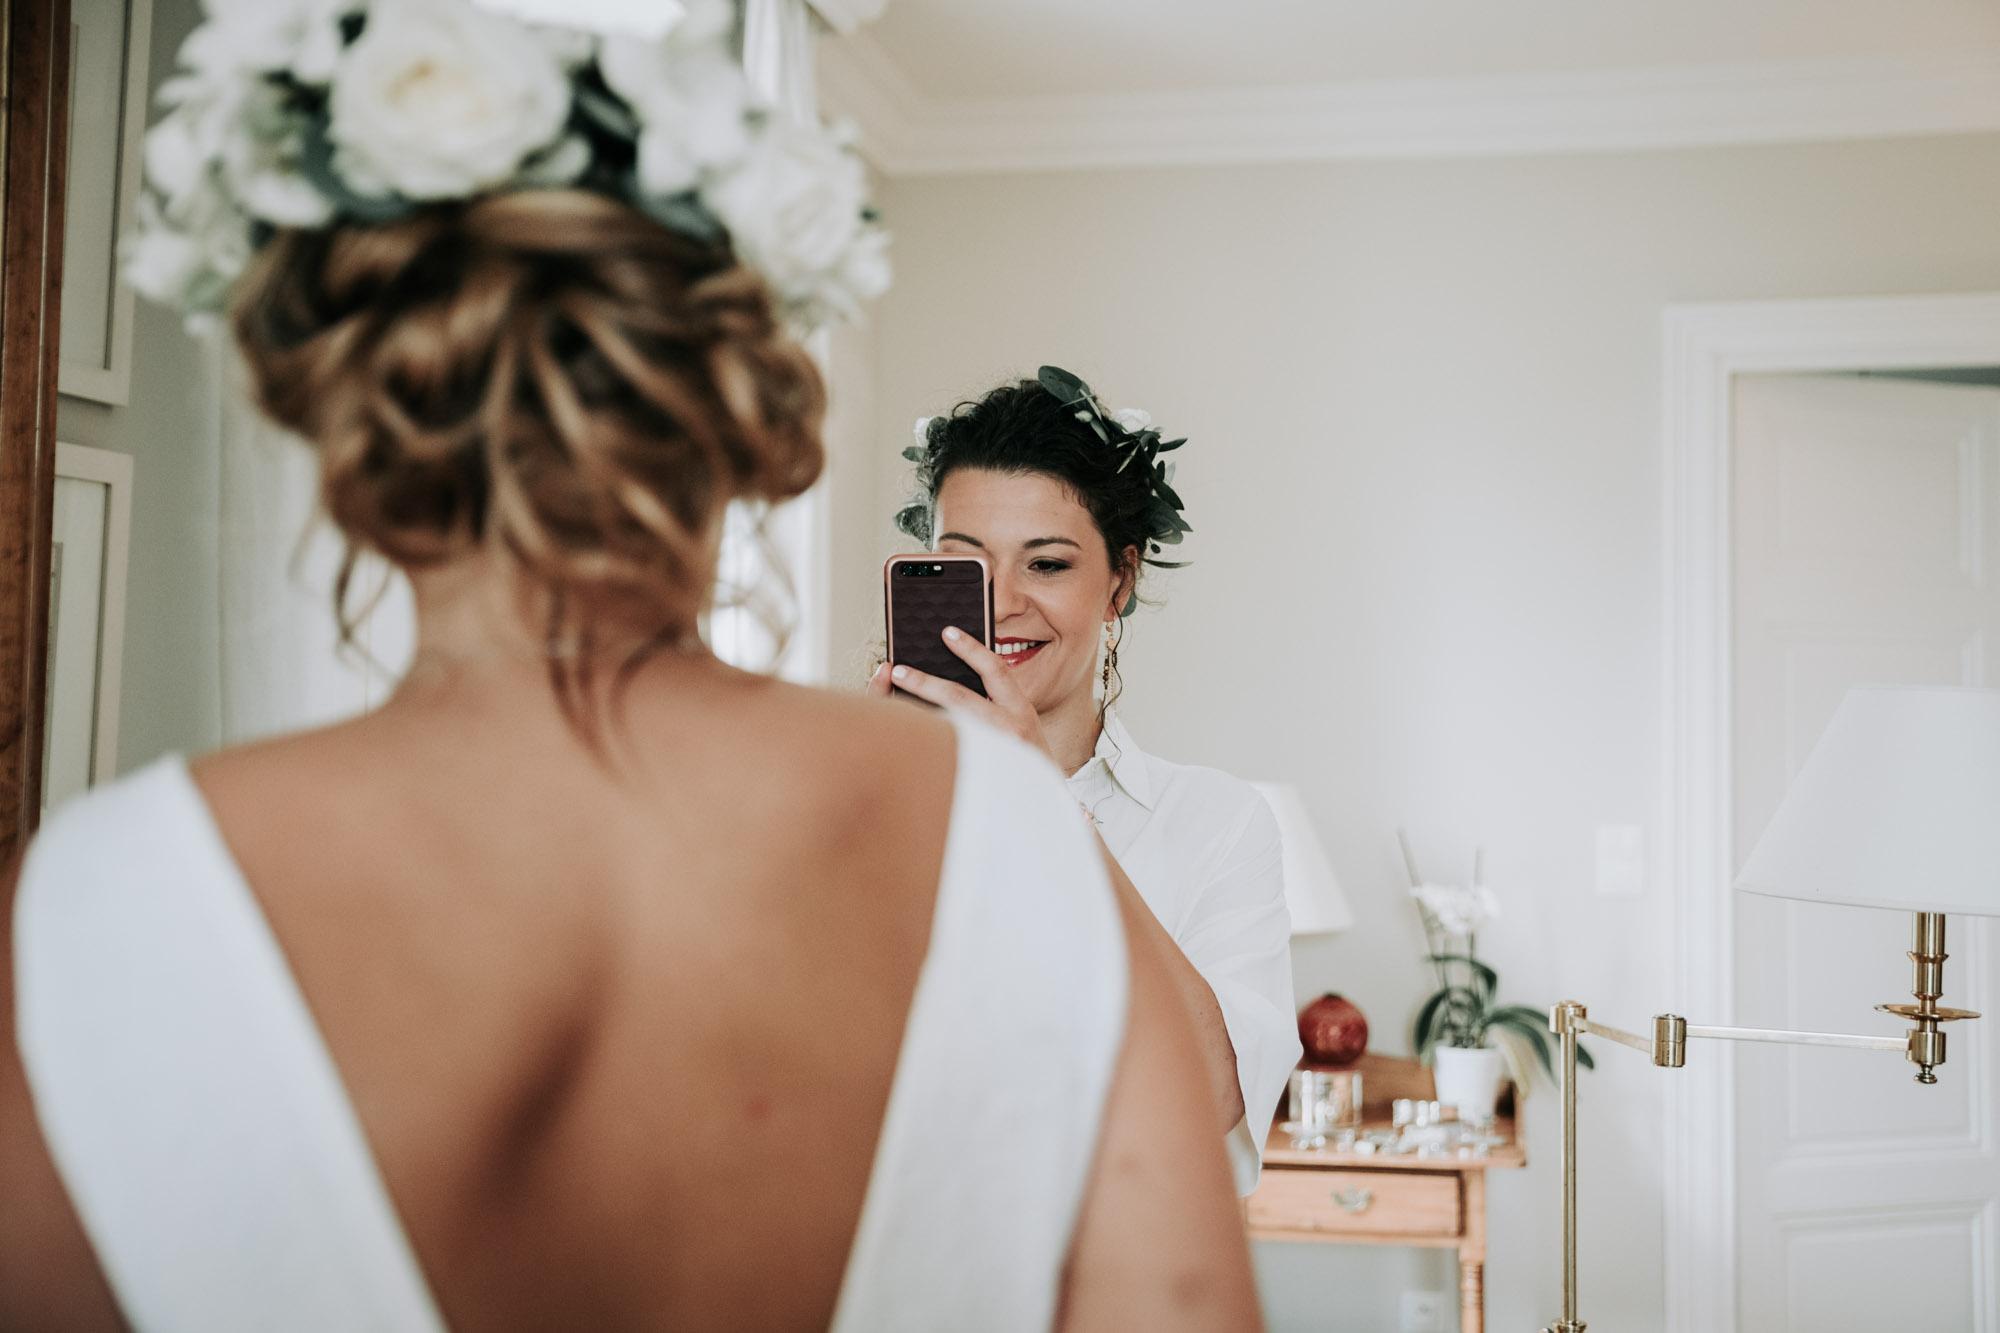 2018-07-21 - LD8_9685 - photographe mariage lyon - laurie diaz - www.lauriediazweeding.com.jpg